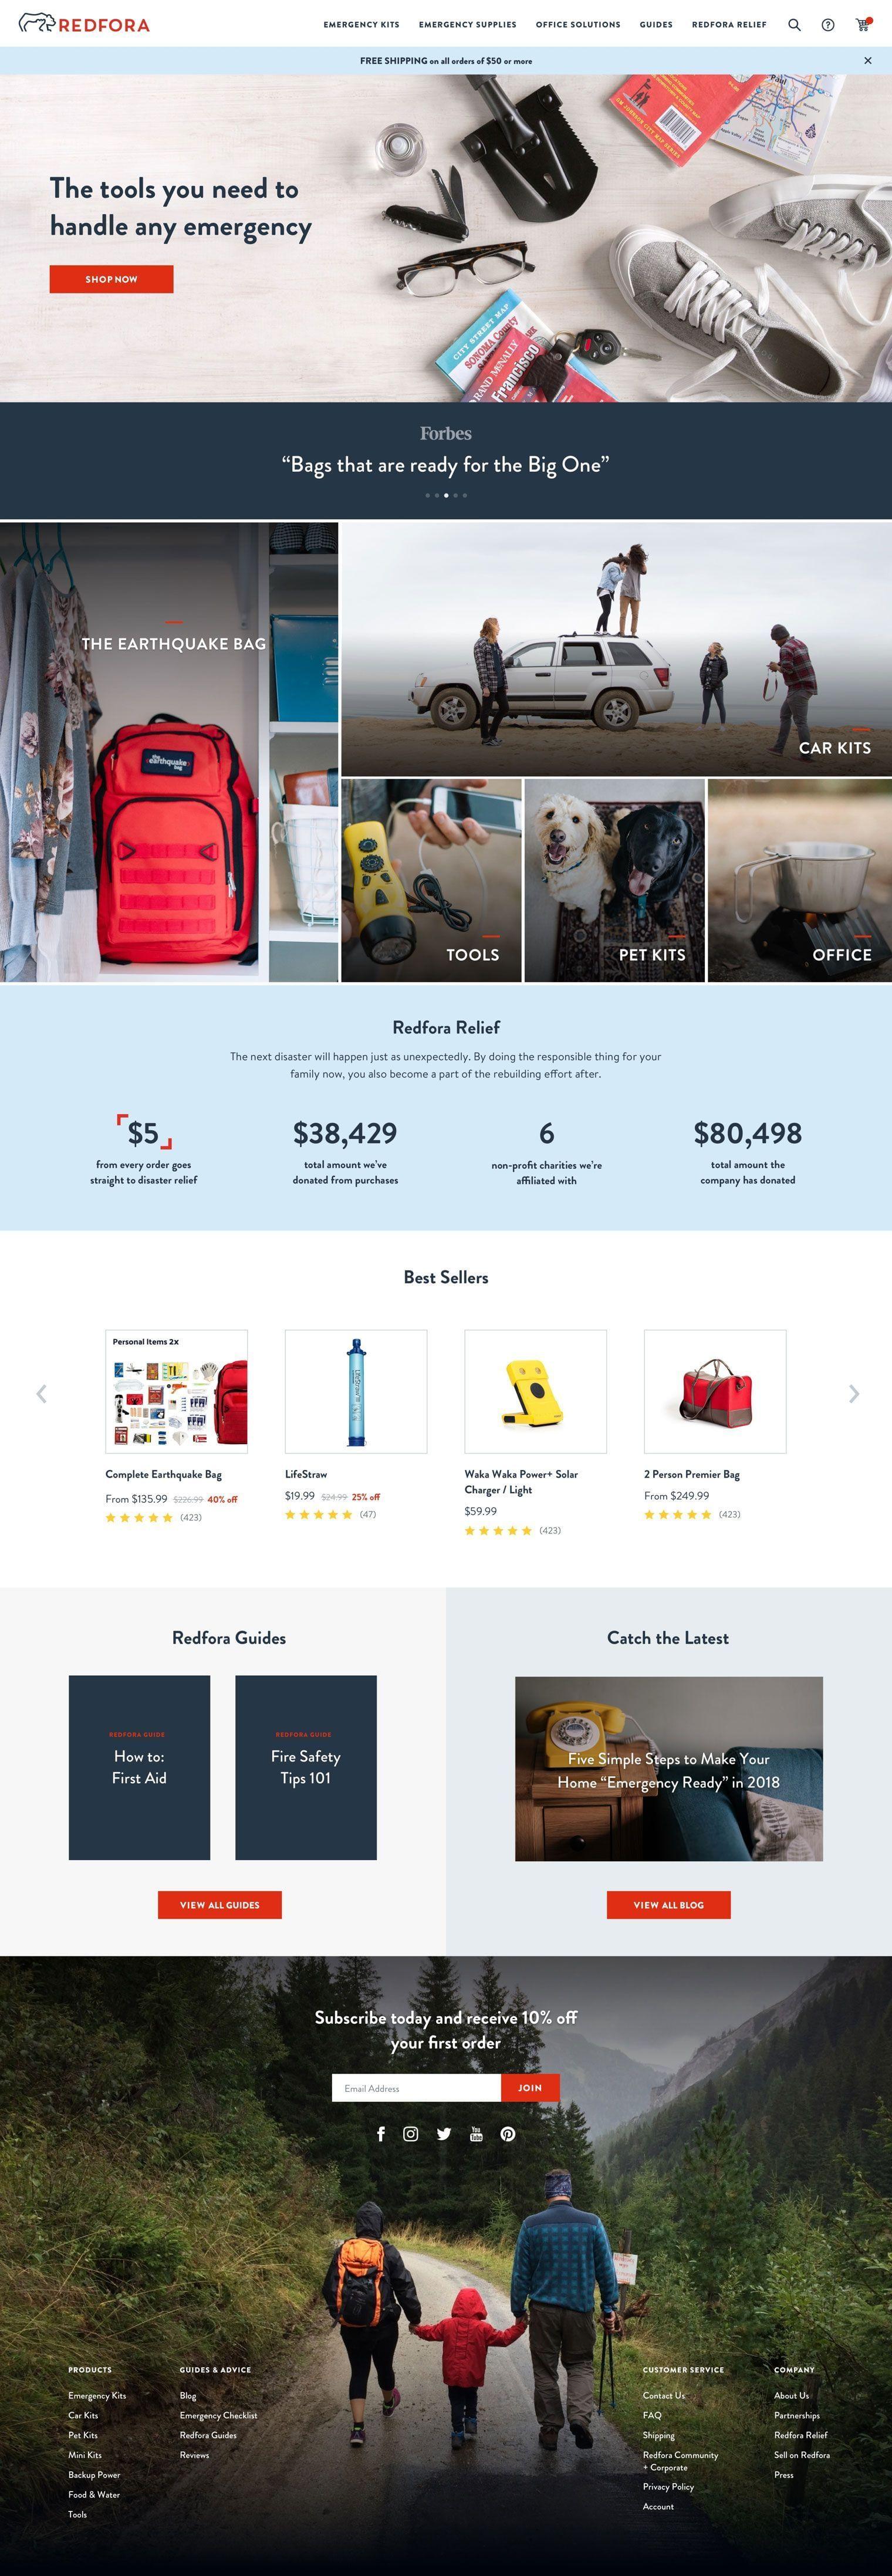 Redfora Homepage